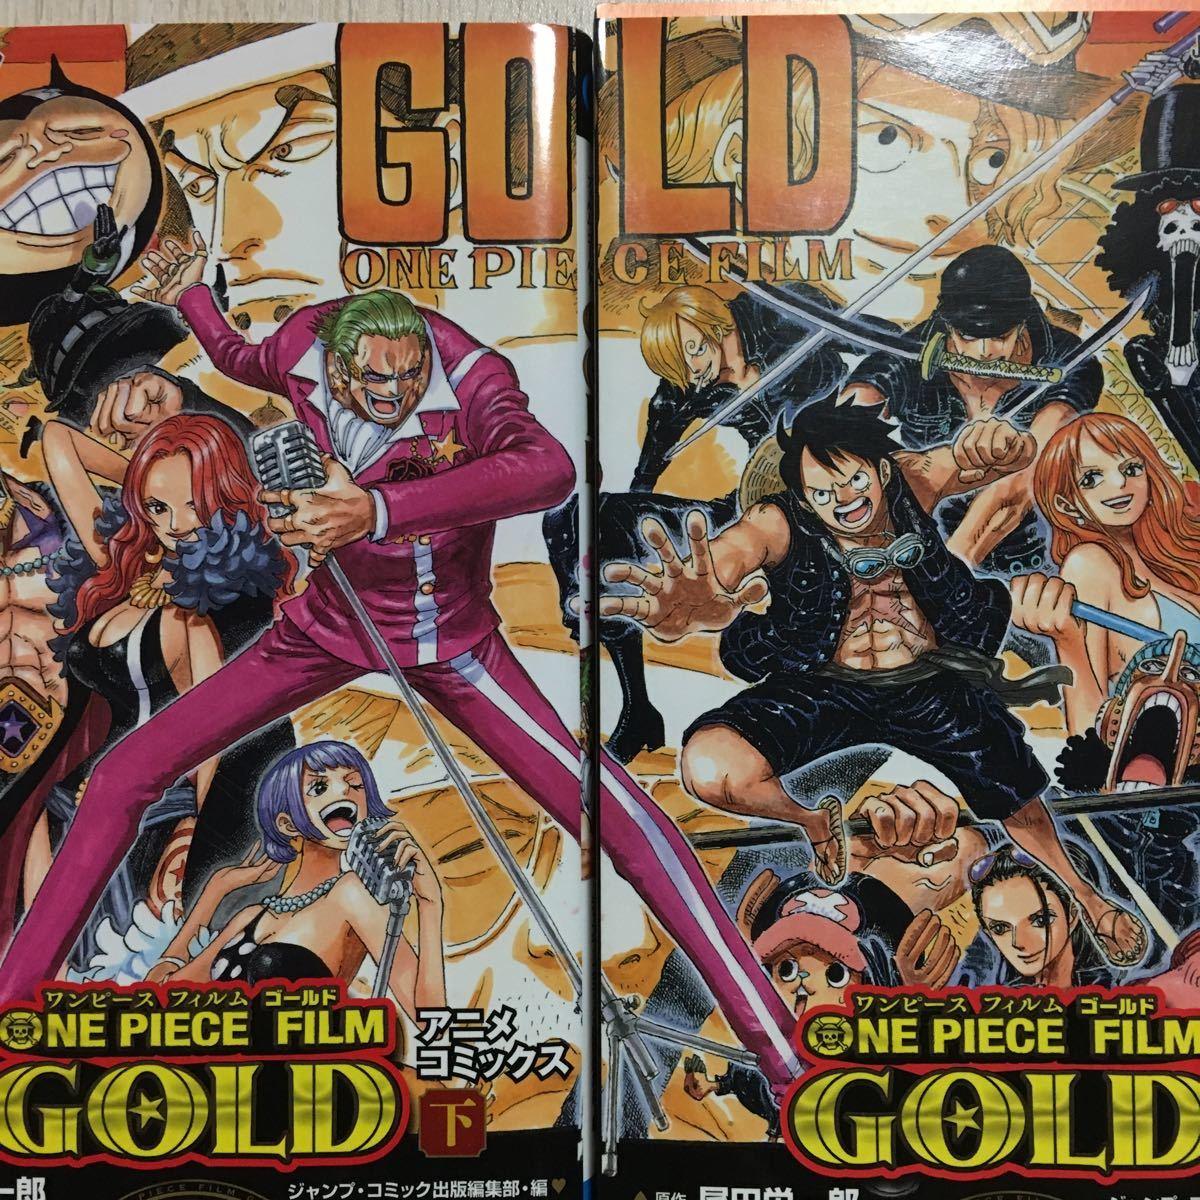 ONE PIECE FILM GOLD (上・下セット)尾田 栄一郎